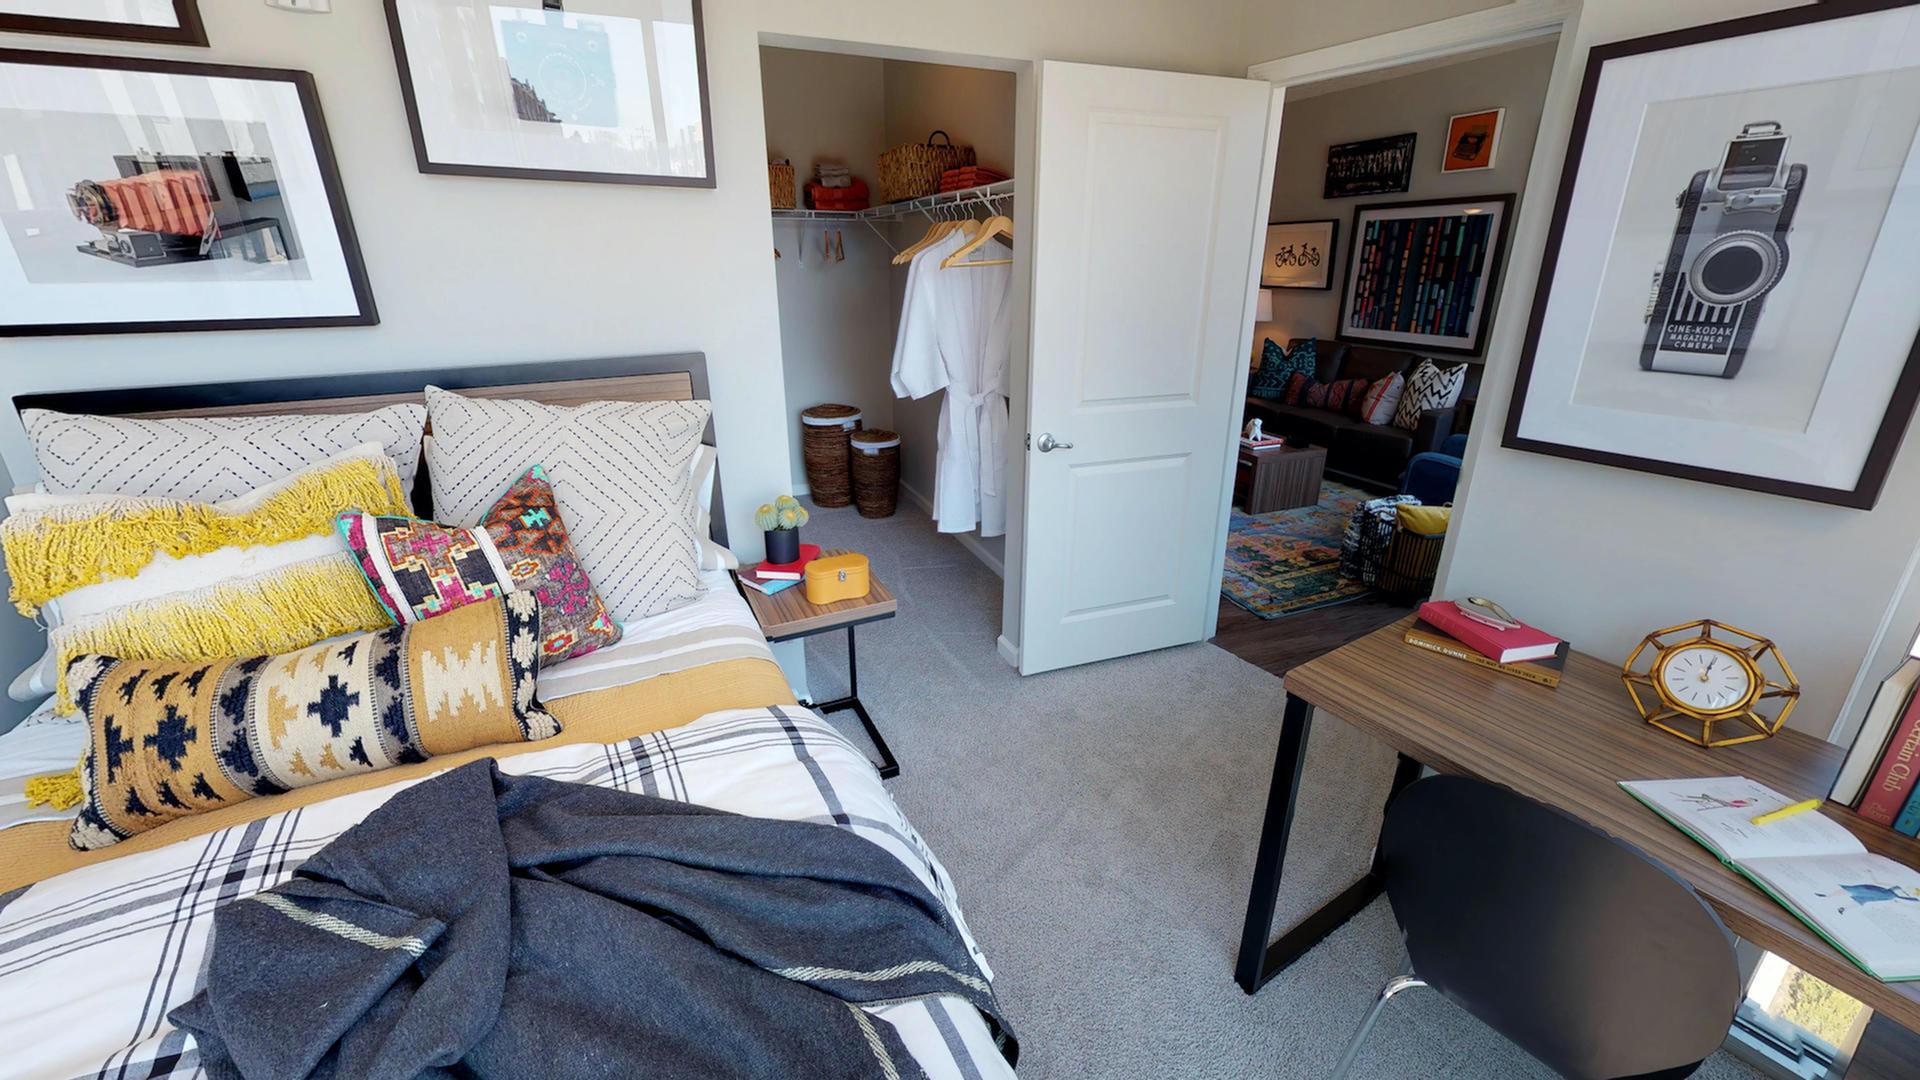 Image of Plush Carpet in Bedroom & Hardwood Style Flooring in Living Room & Kitchen for Luxe Belle- Student Living